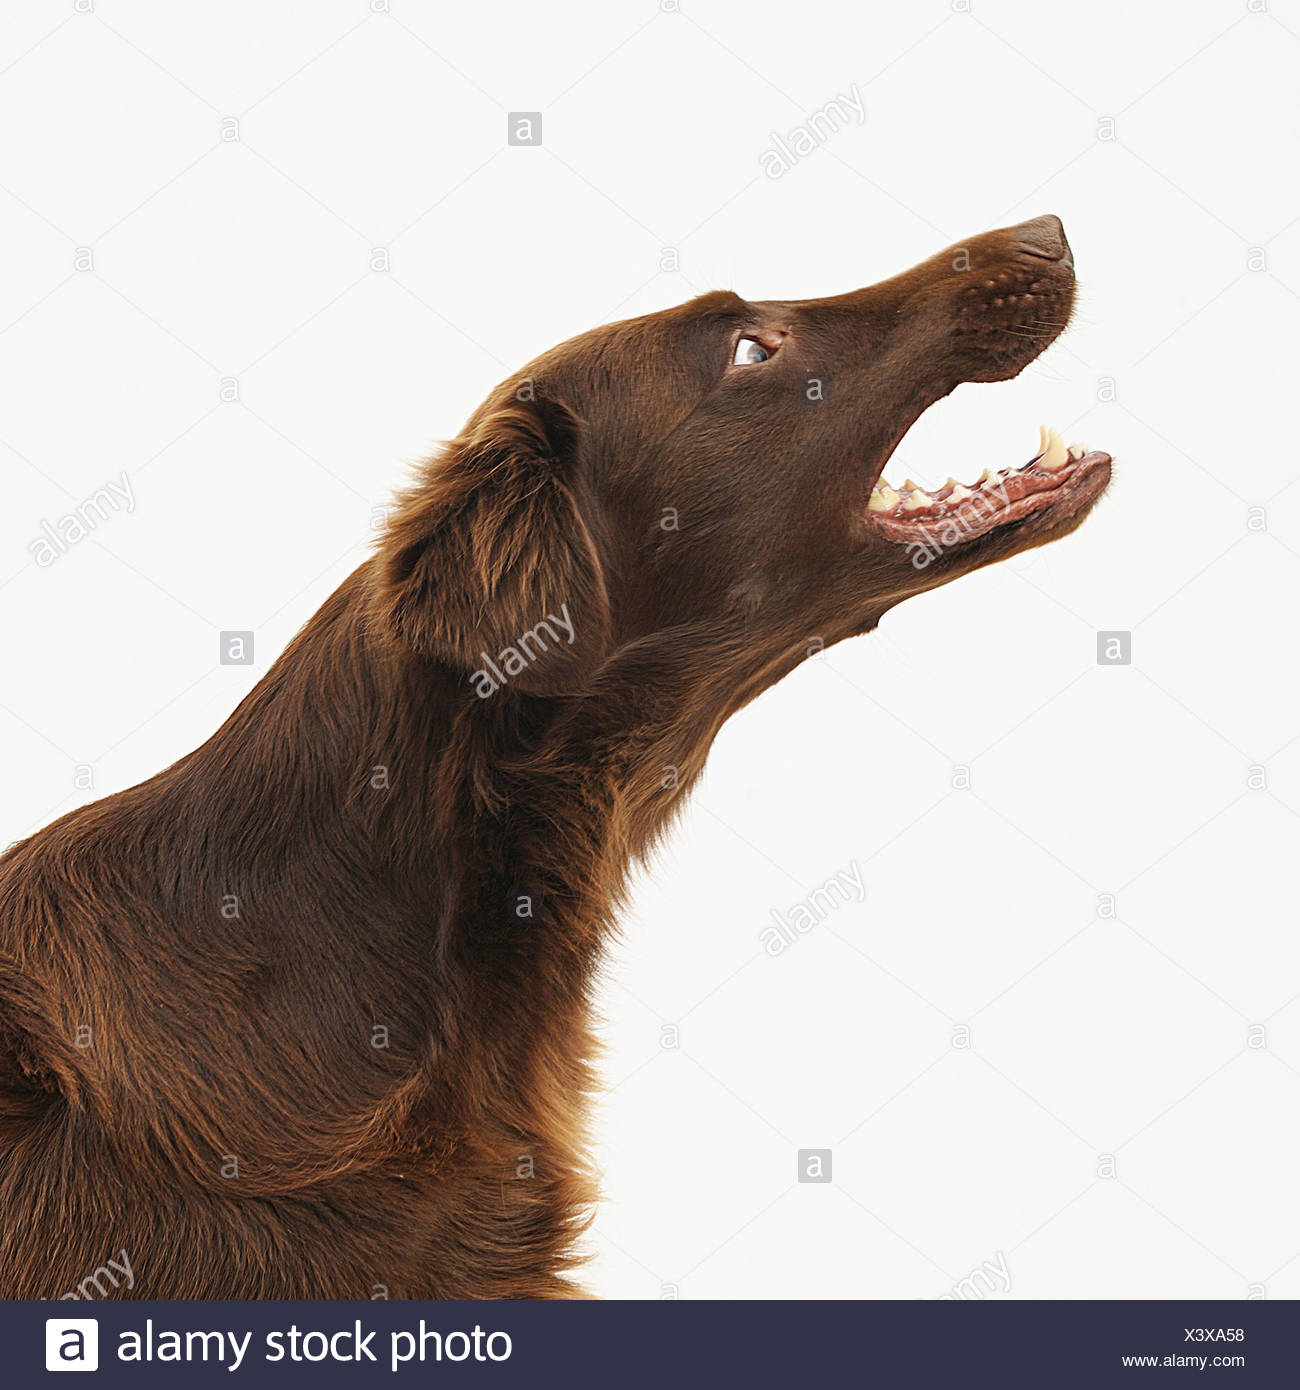 A brown dog barks - Stock Image